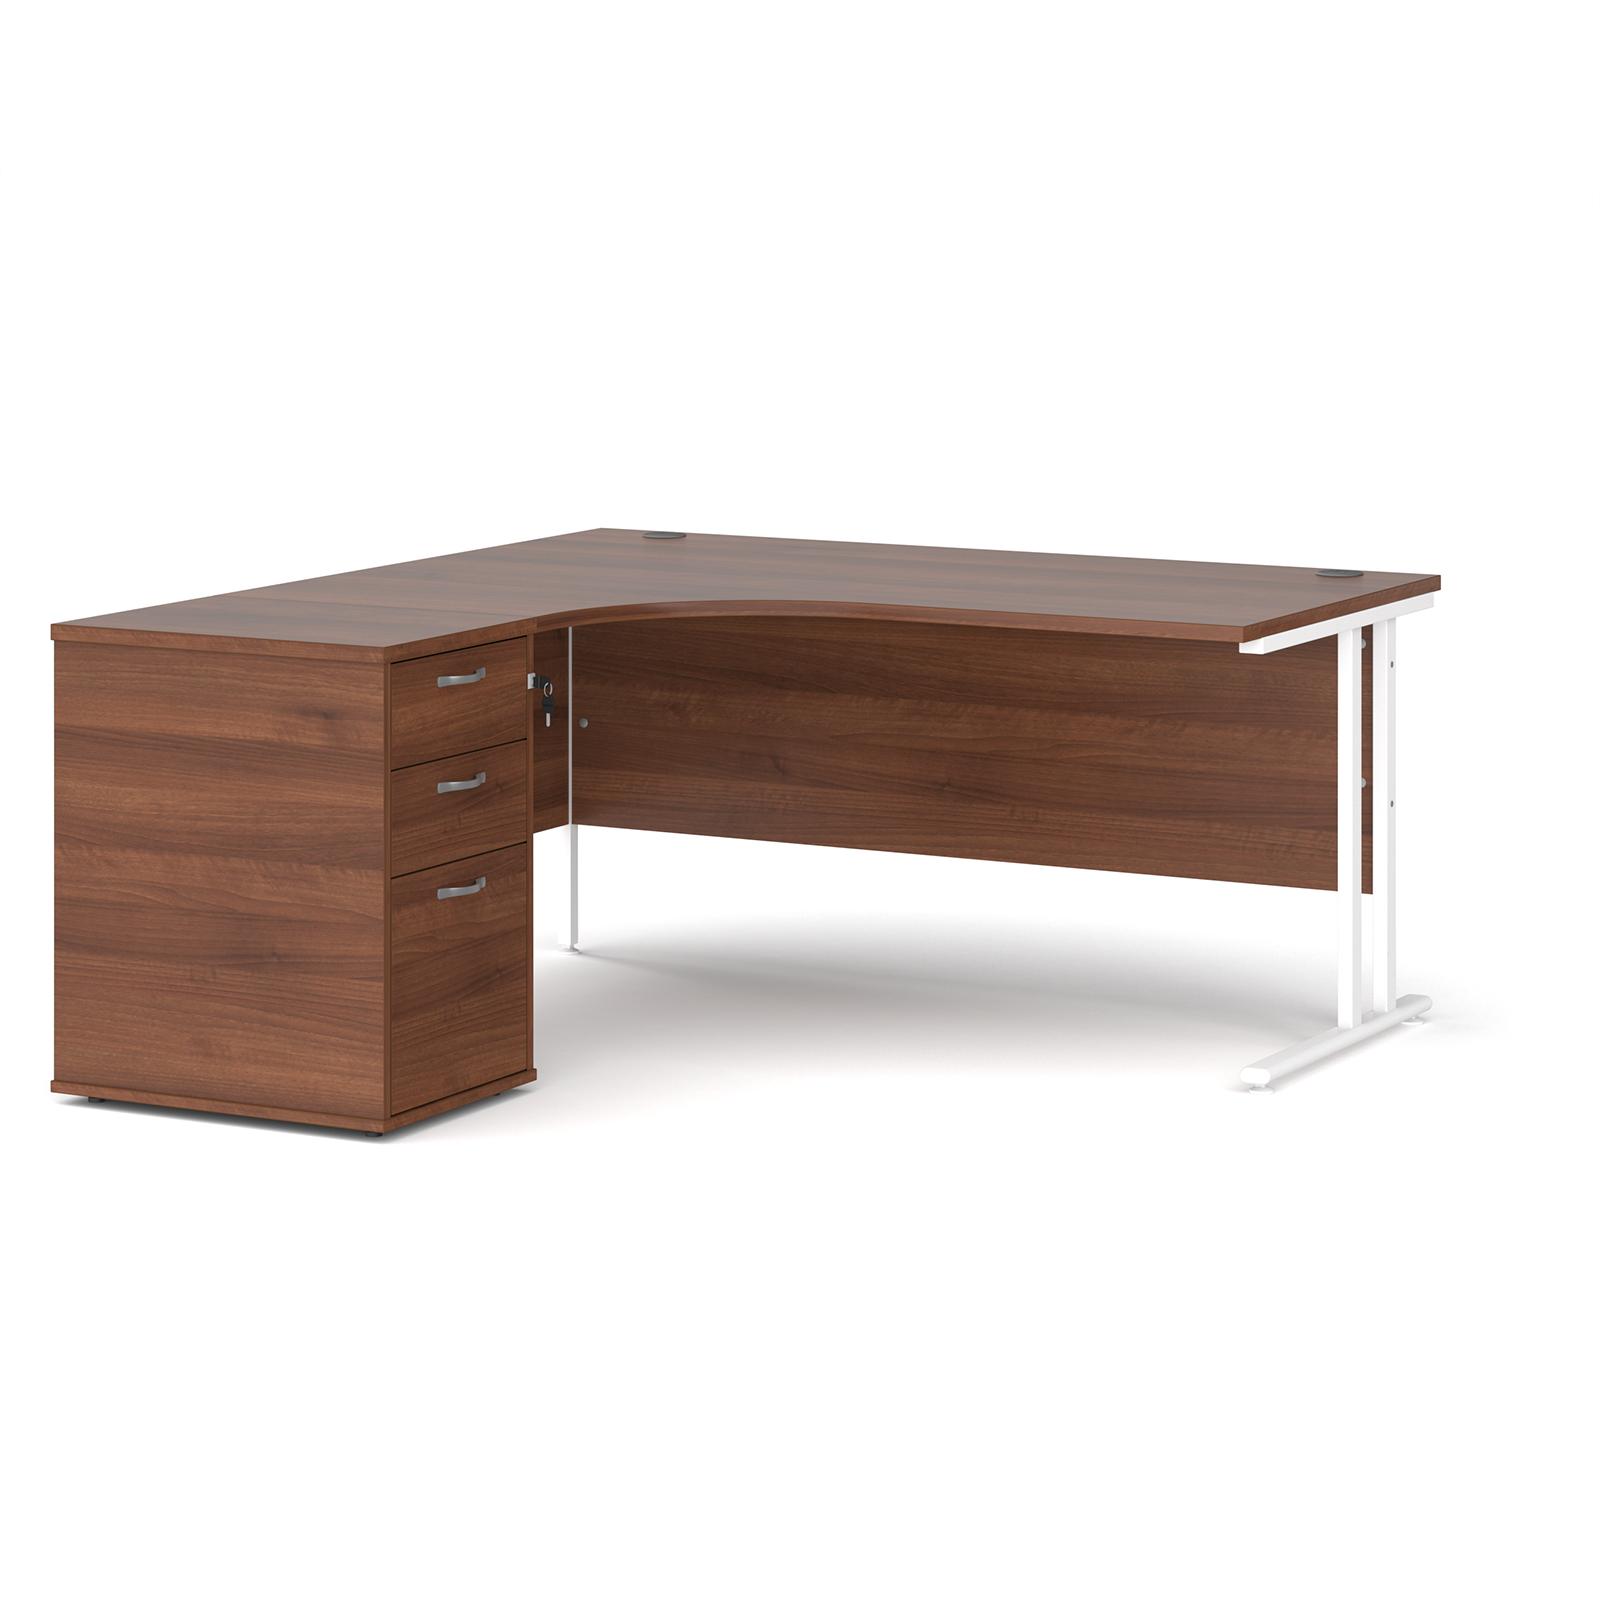 Left Handed Maestro 25 left hand ergonomic desk 1600mm with white cantilever frame and desk high pedestal - walnut